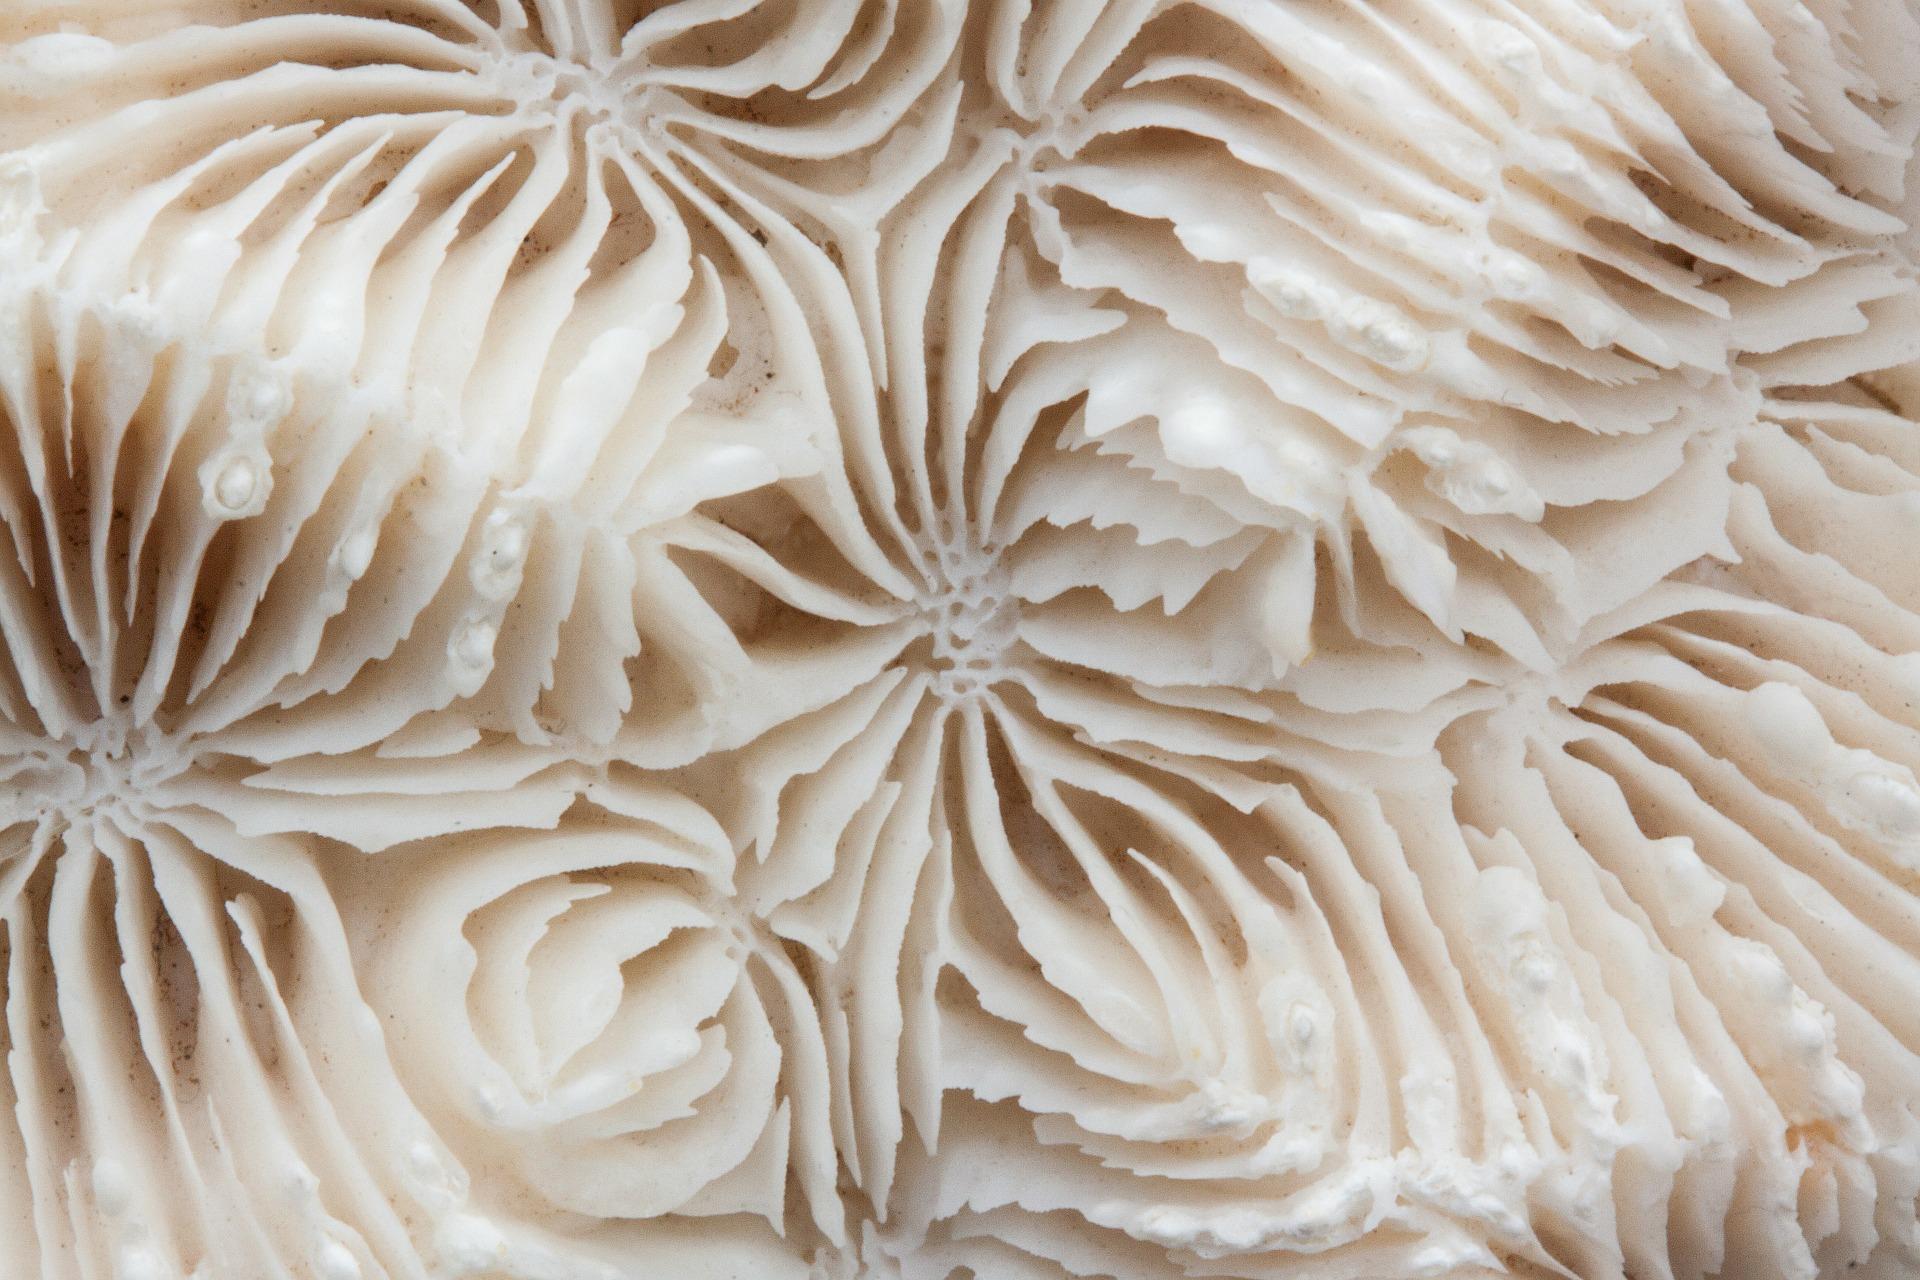 brain-coral-stux.jpg